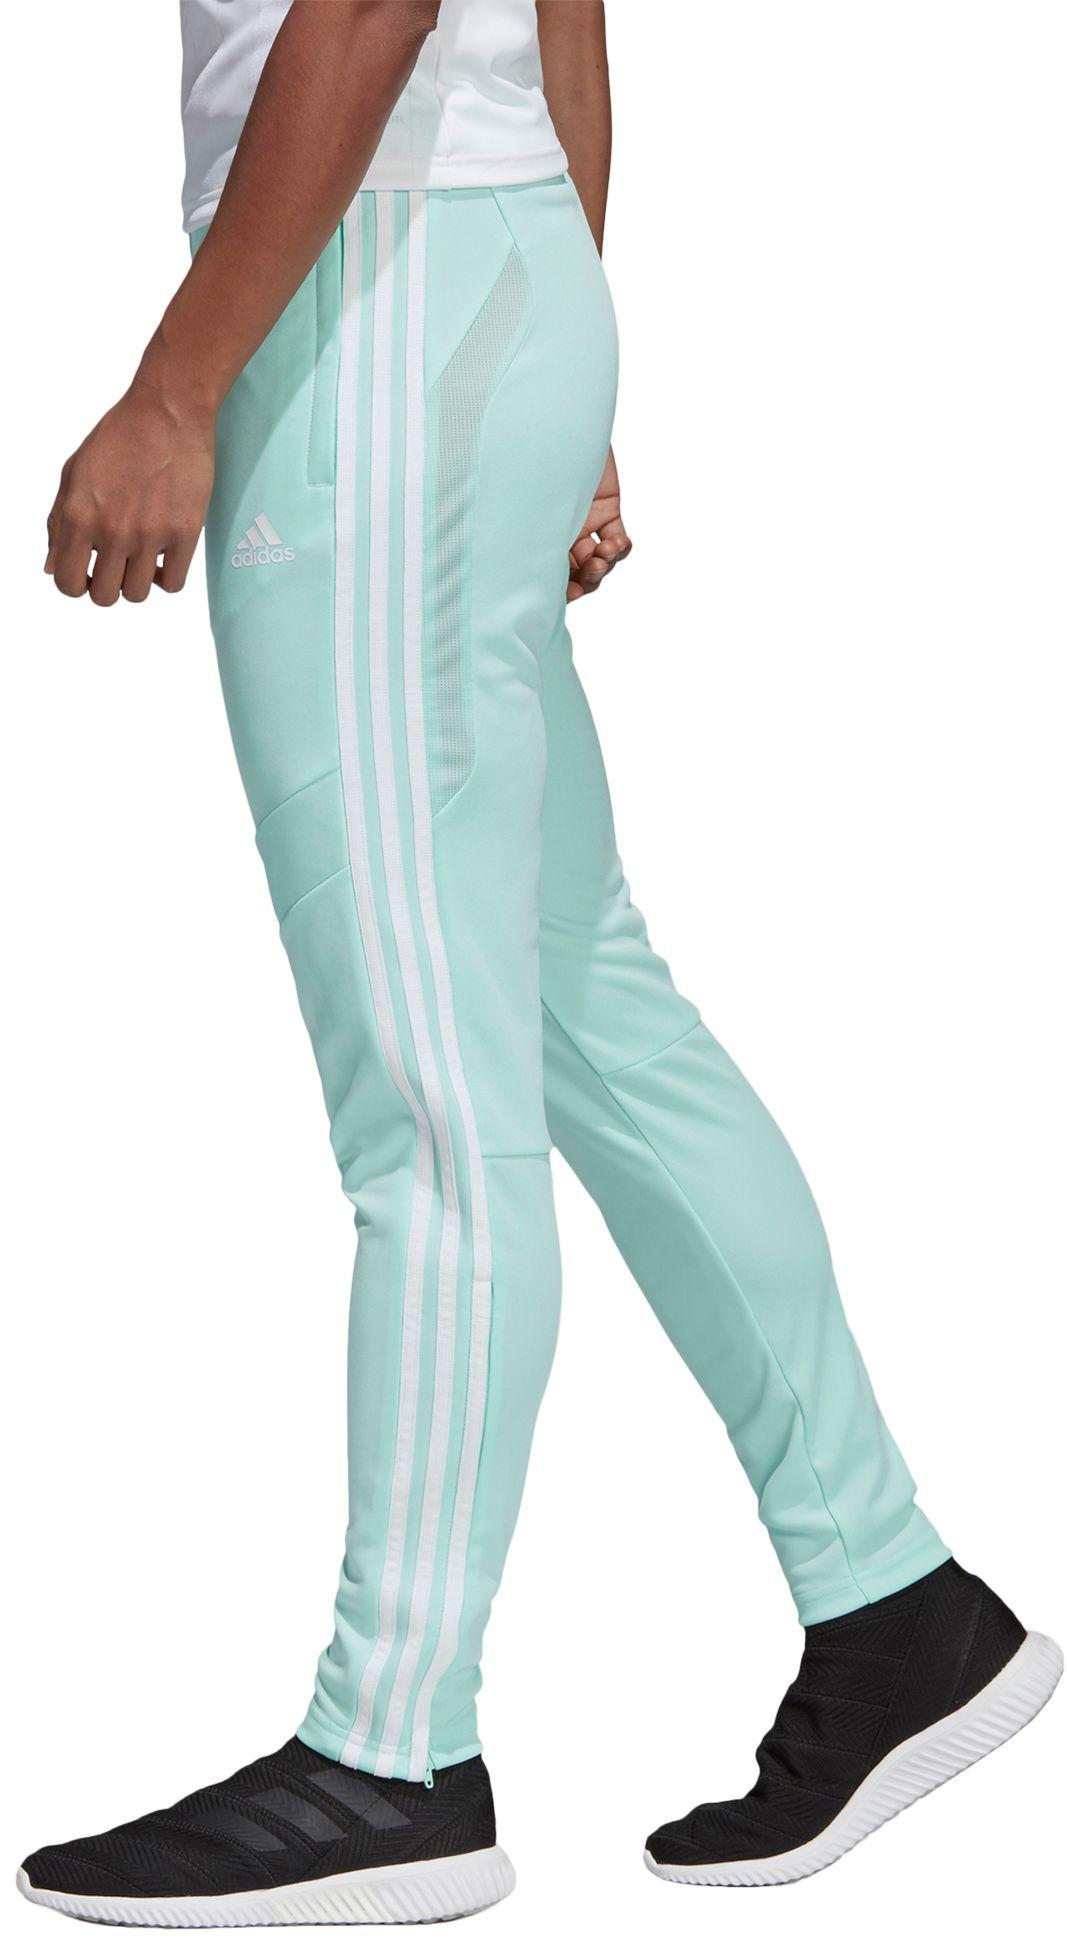 b2335e10a0 adidas Women's Tiro 19 Training Pants in 2019 | Products | Adidas ...